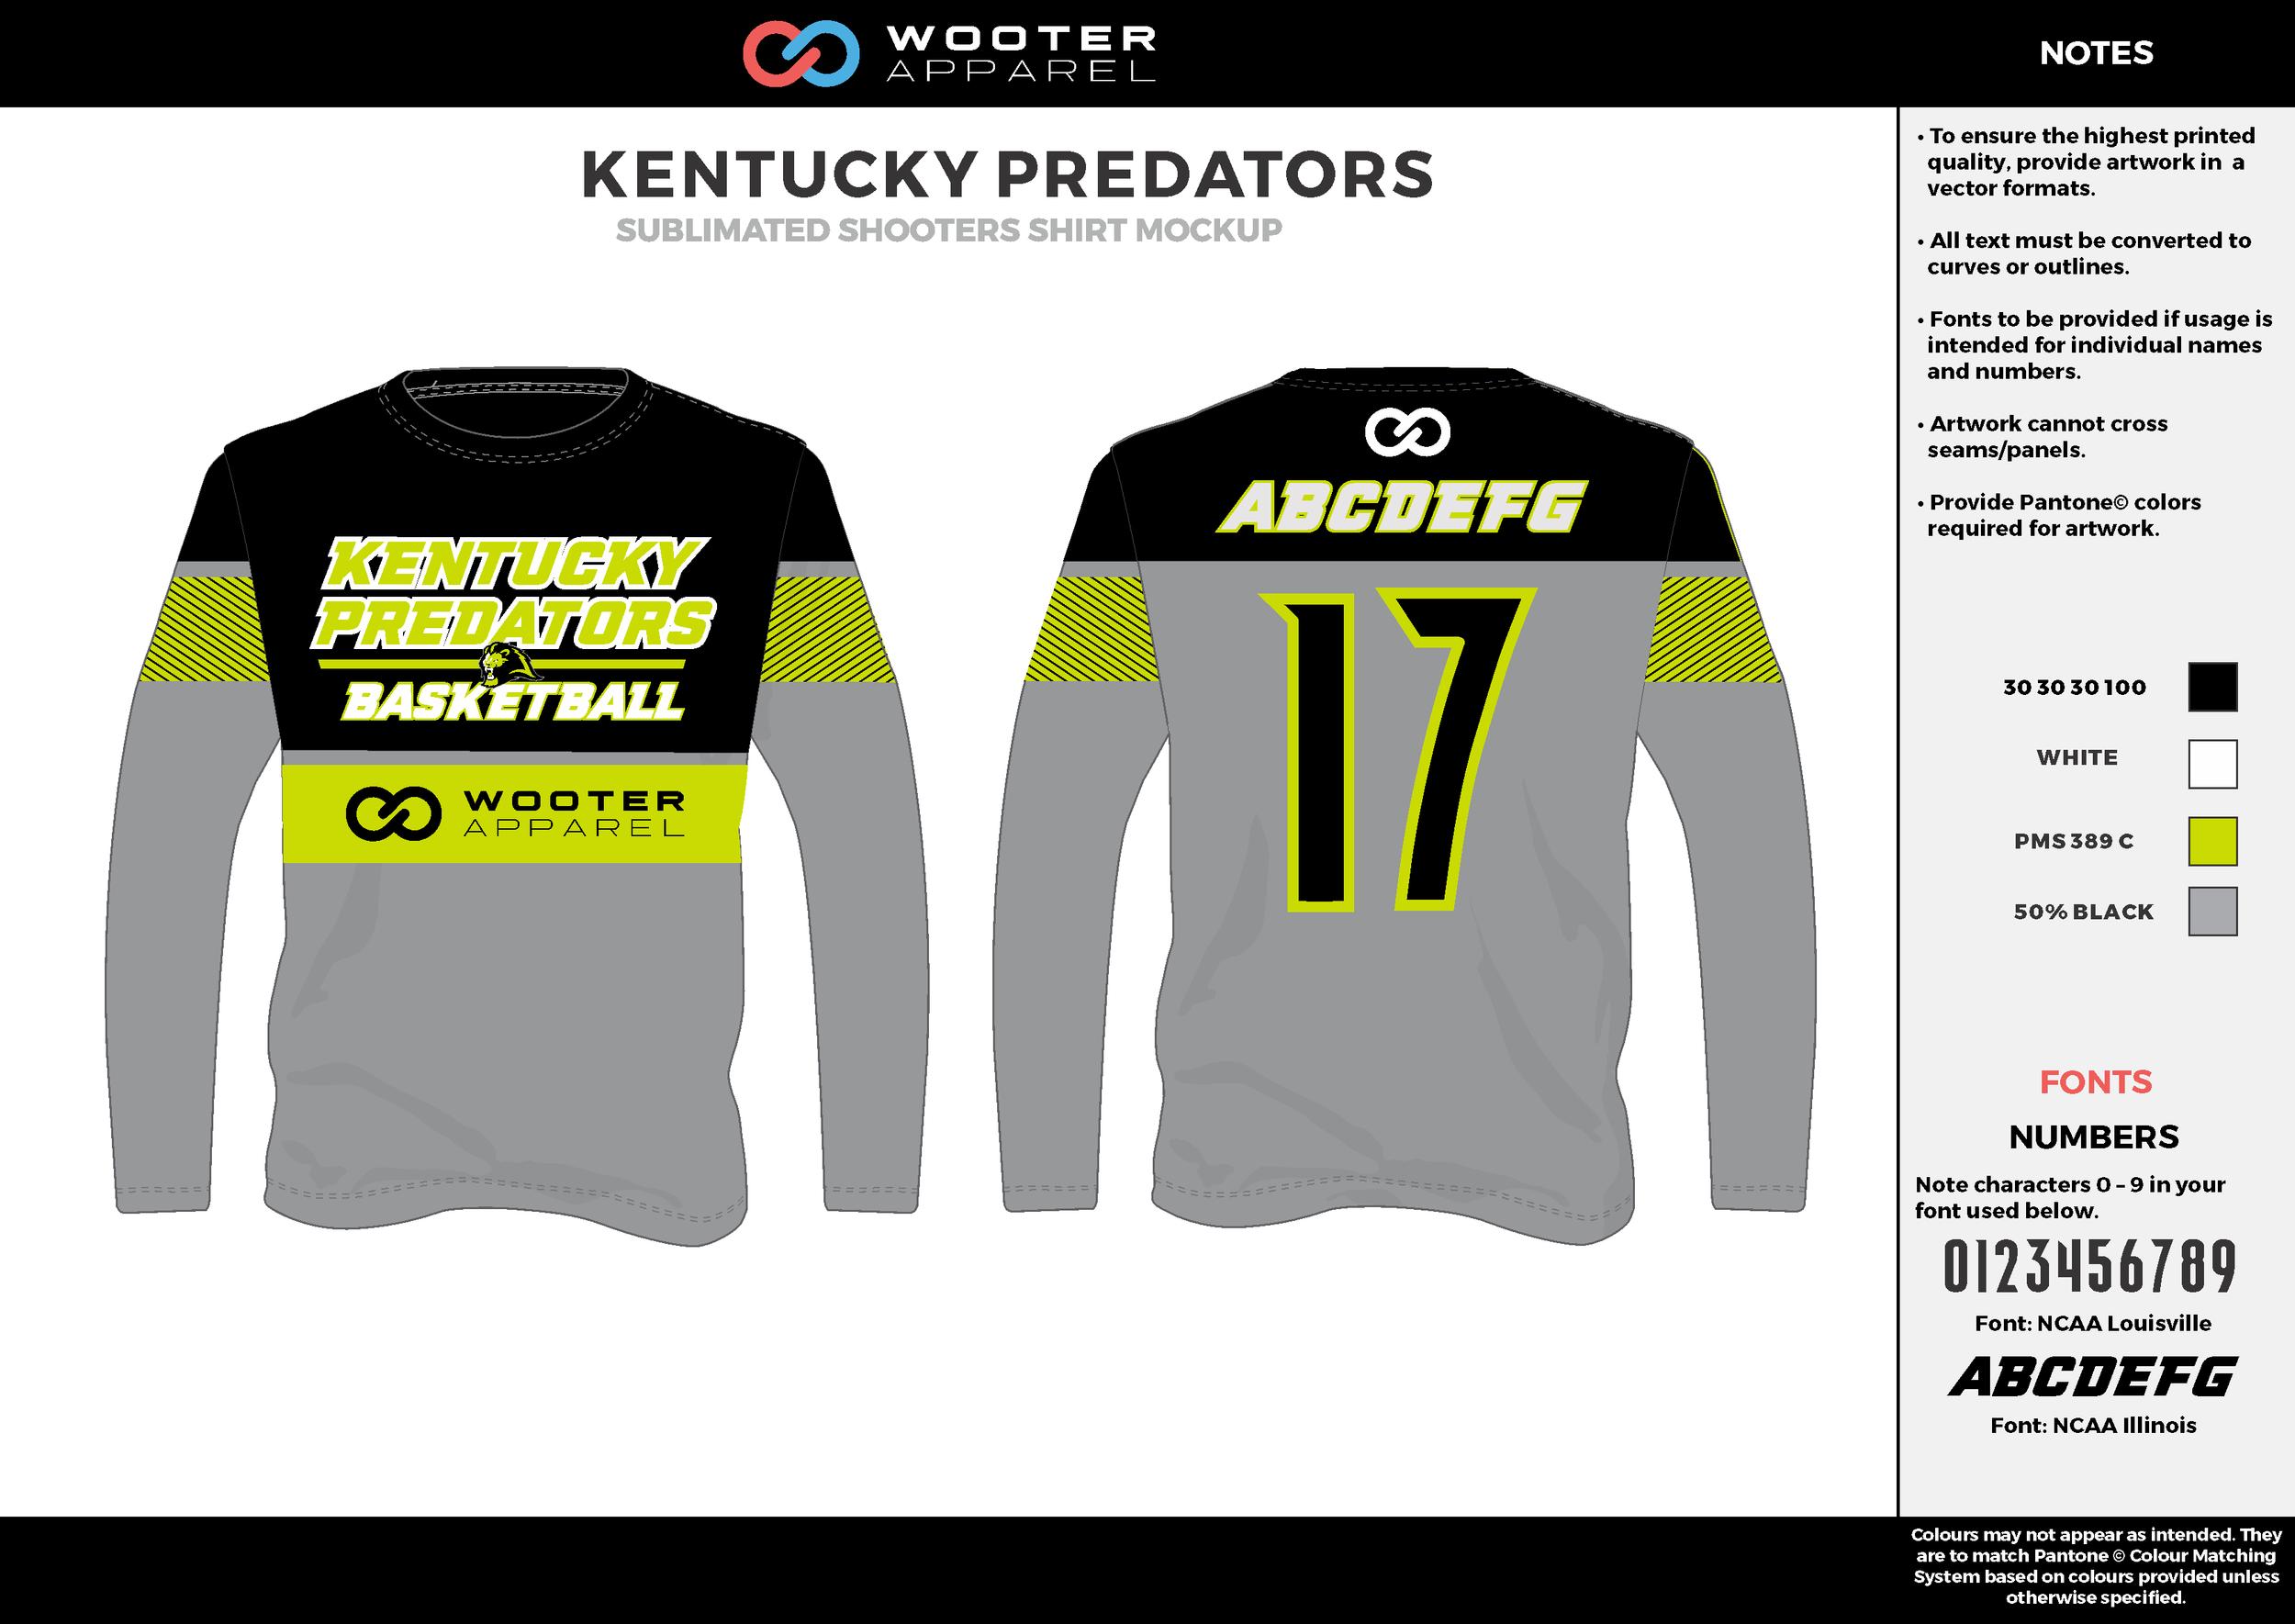 KENTUCKY PREDATORS black cool gray lime white custom design t-shirts